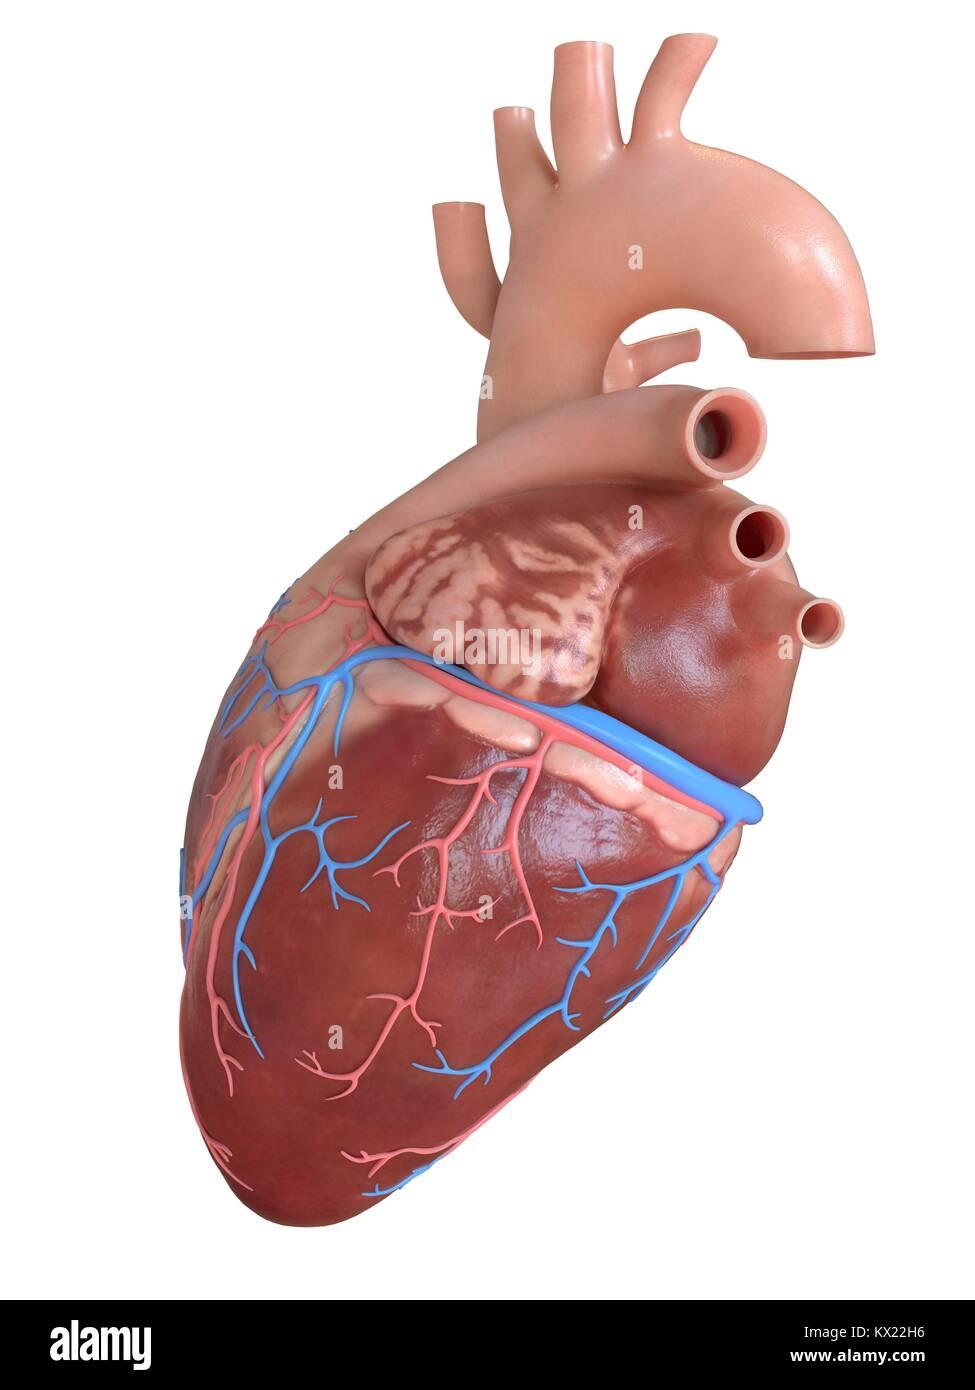 Human Heart With Coronary Veins And Arteries Illustration Stock